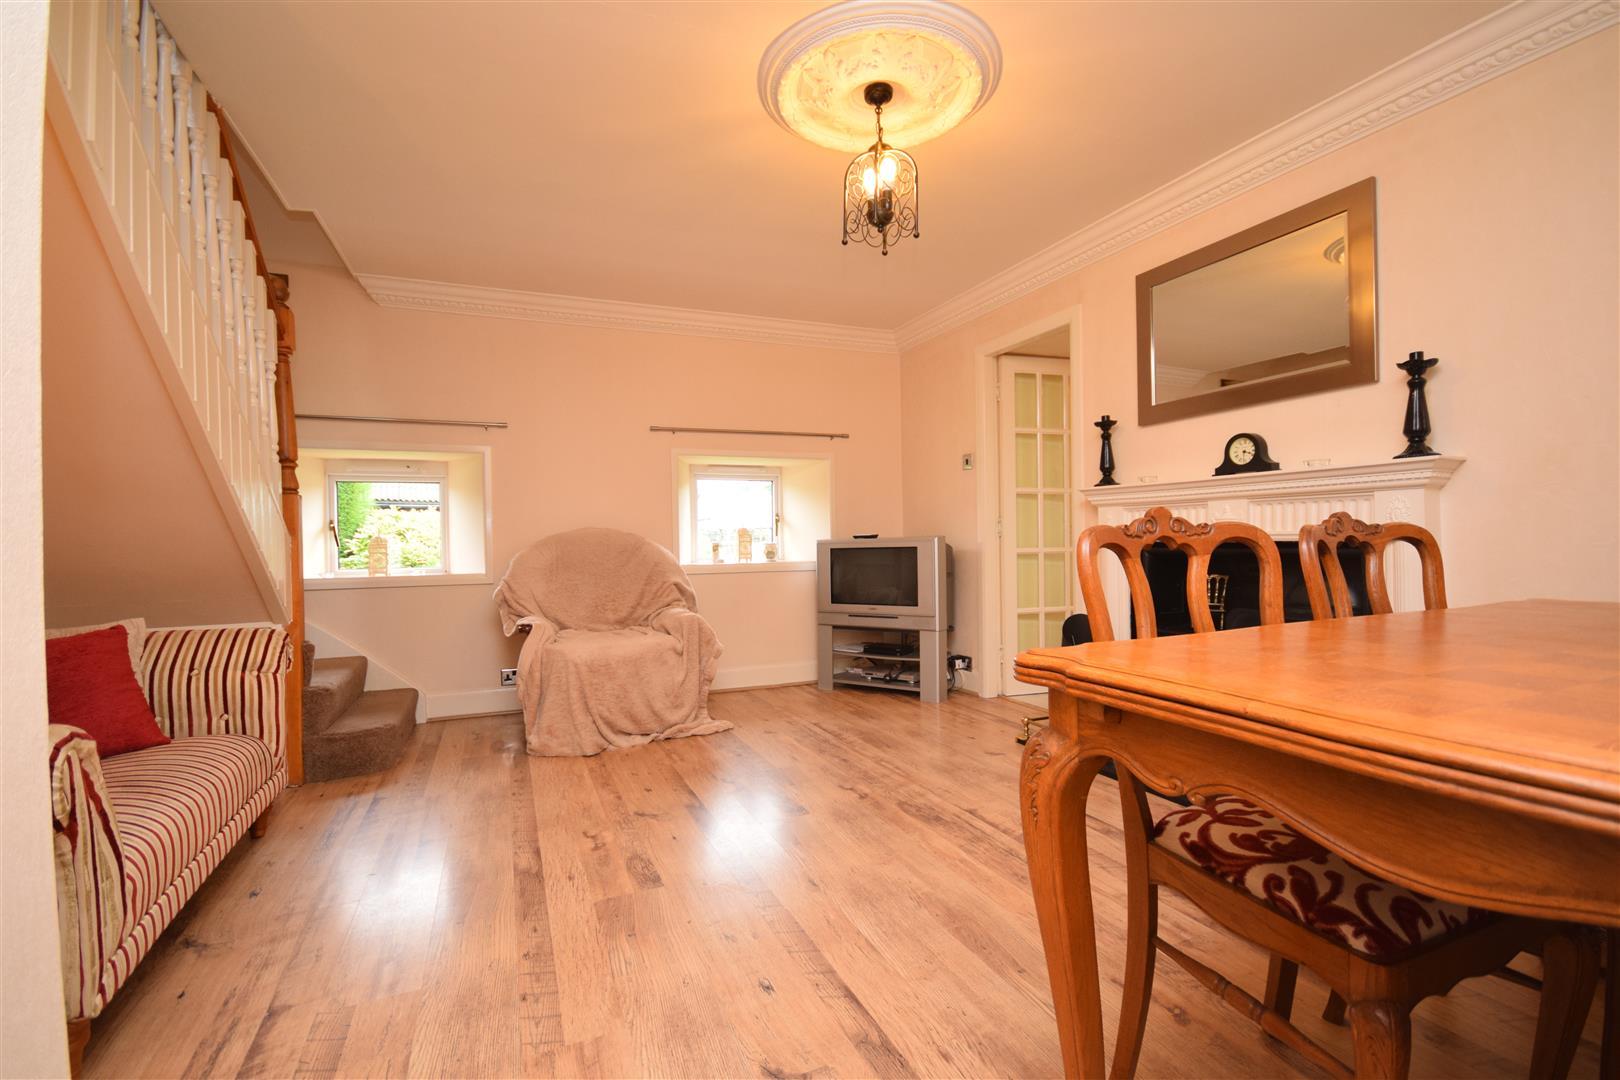 Rhettland Cottage, North Murie, Errol, Perthshire, PH2 7RL, UK